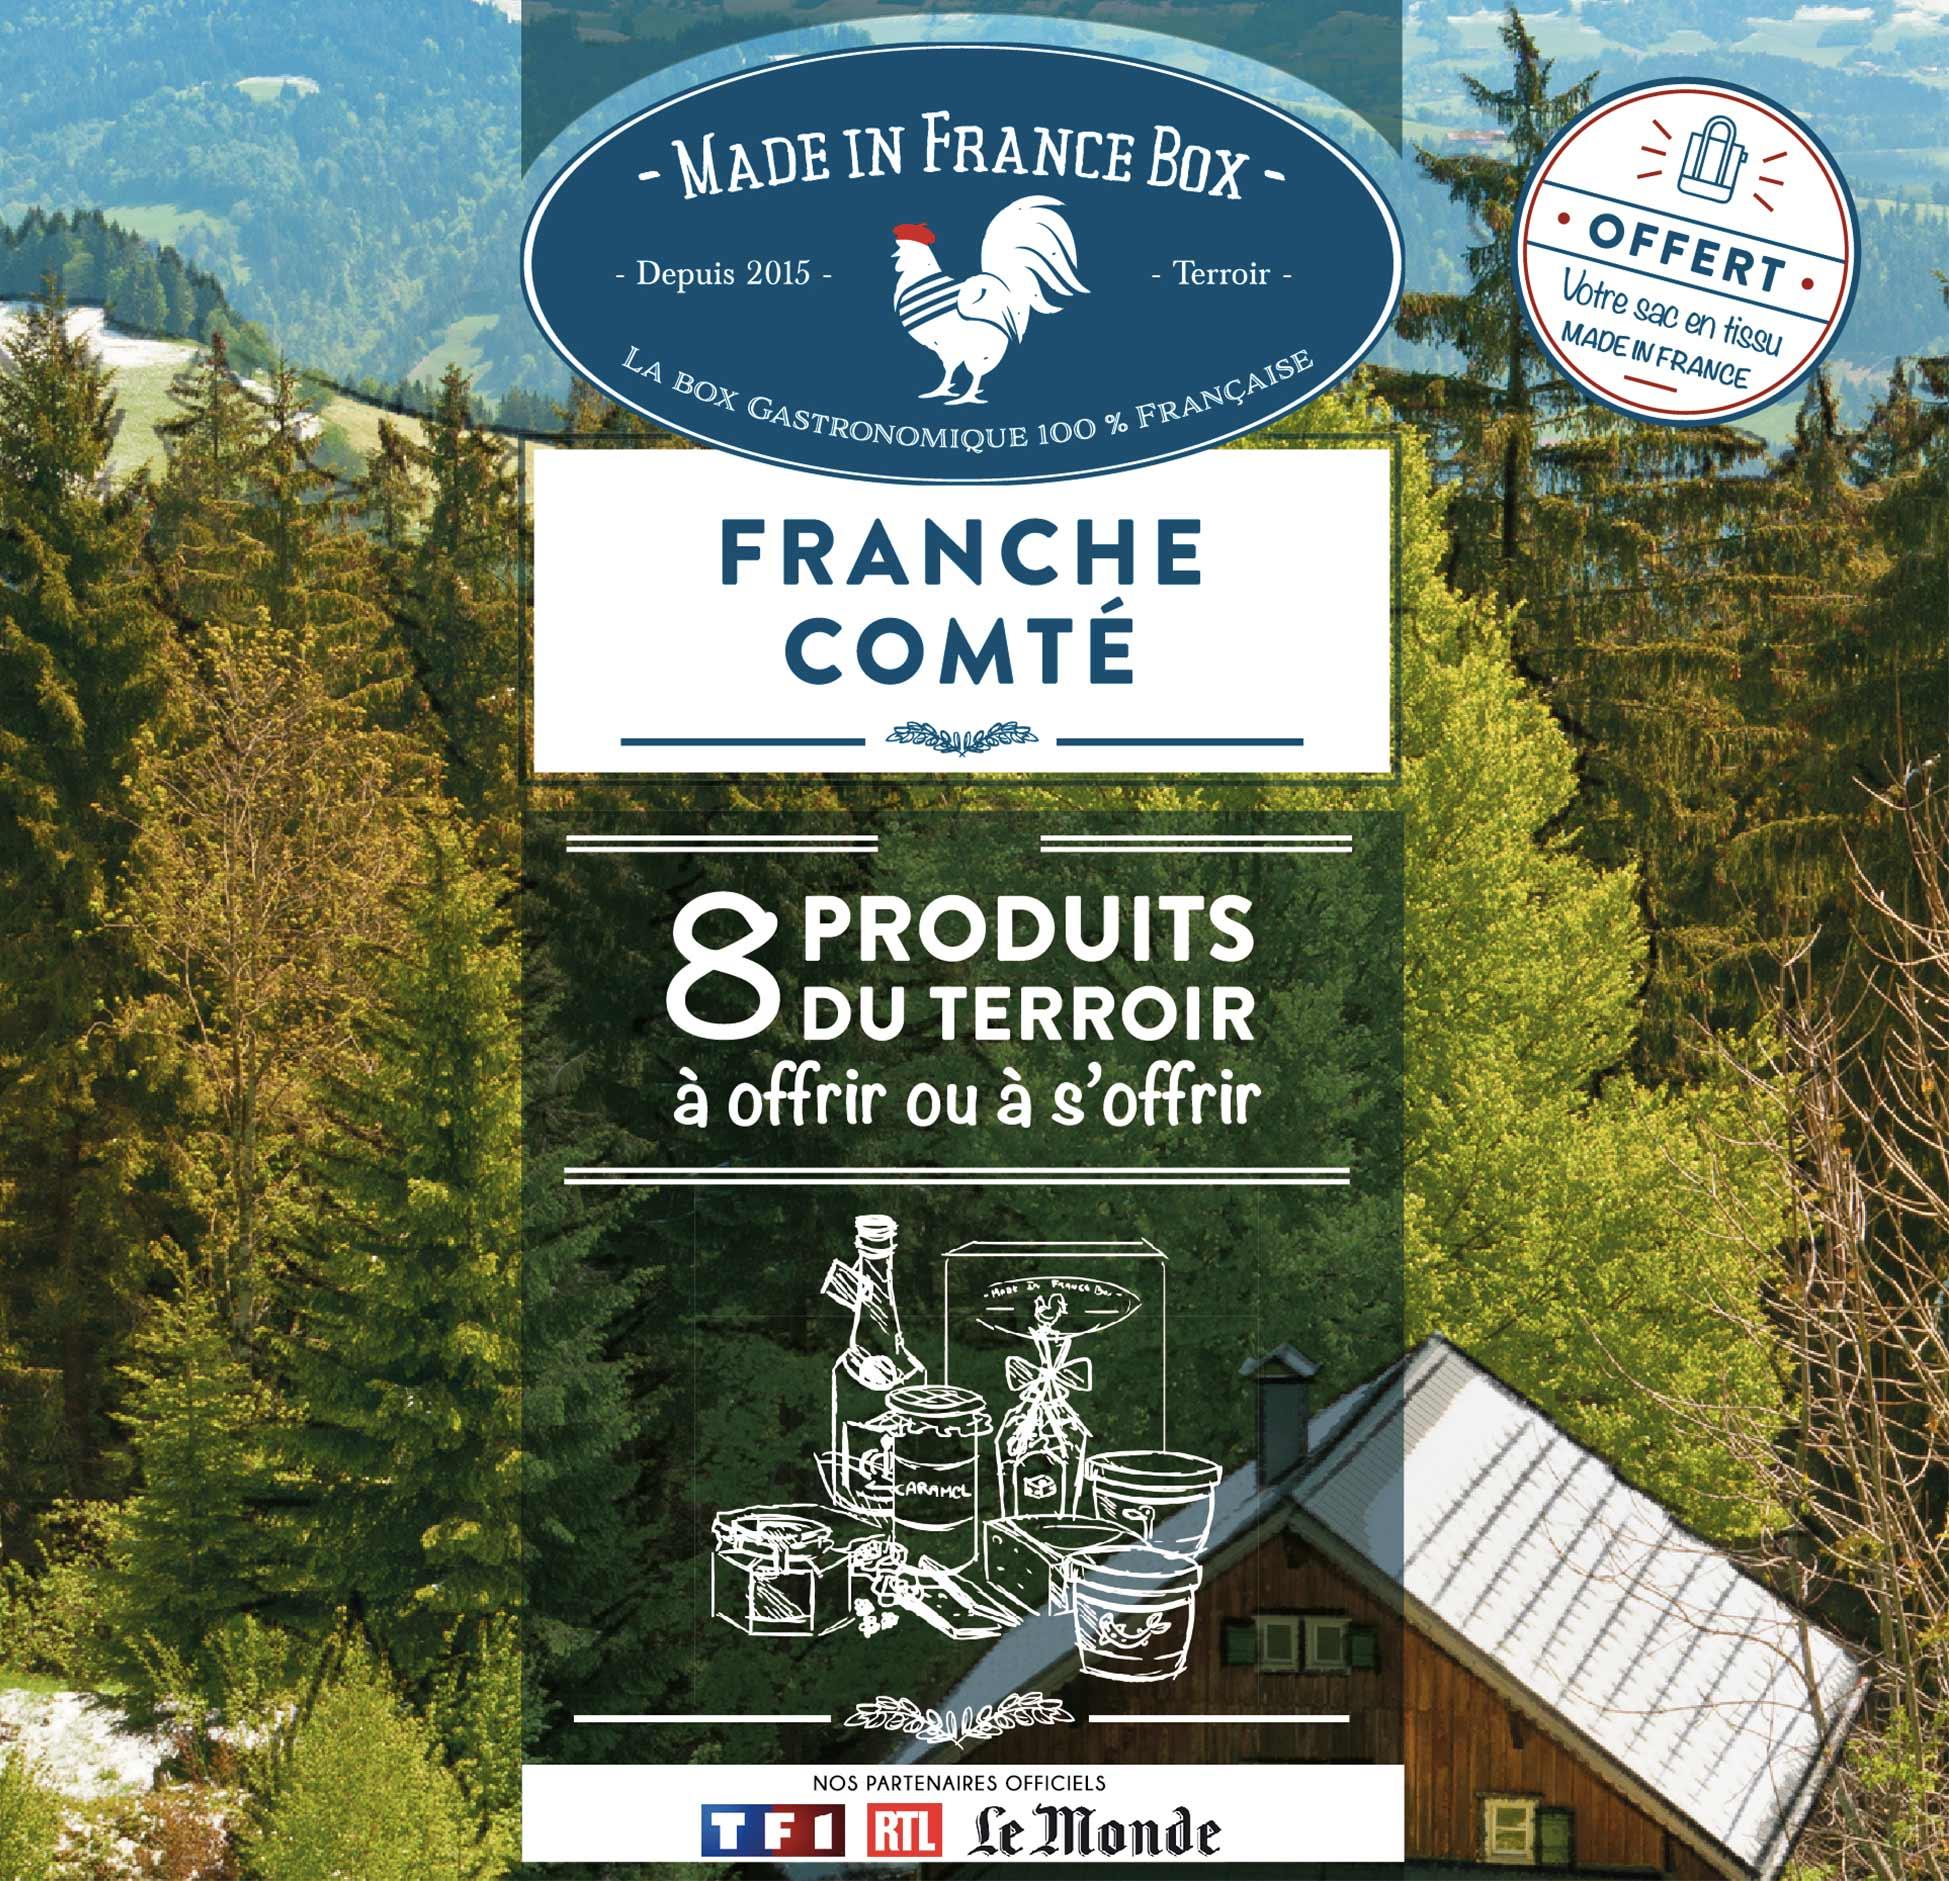 170207_FRANCHE_COMTE_WEB